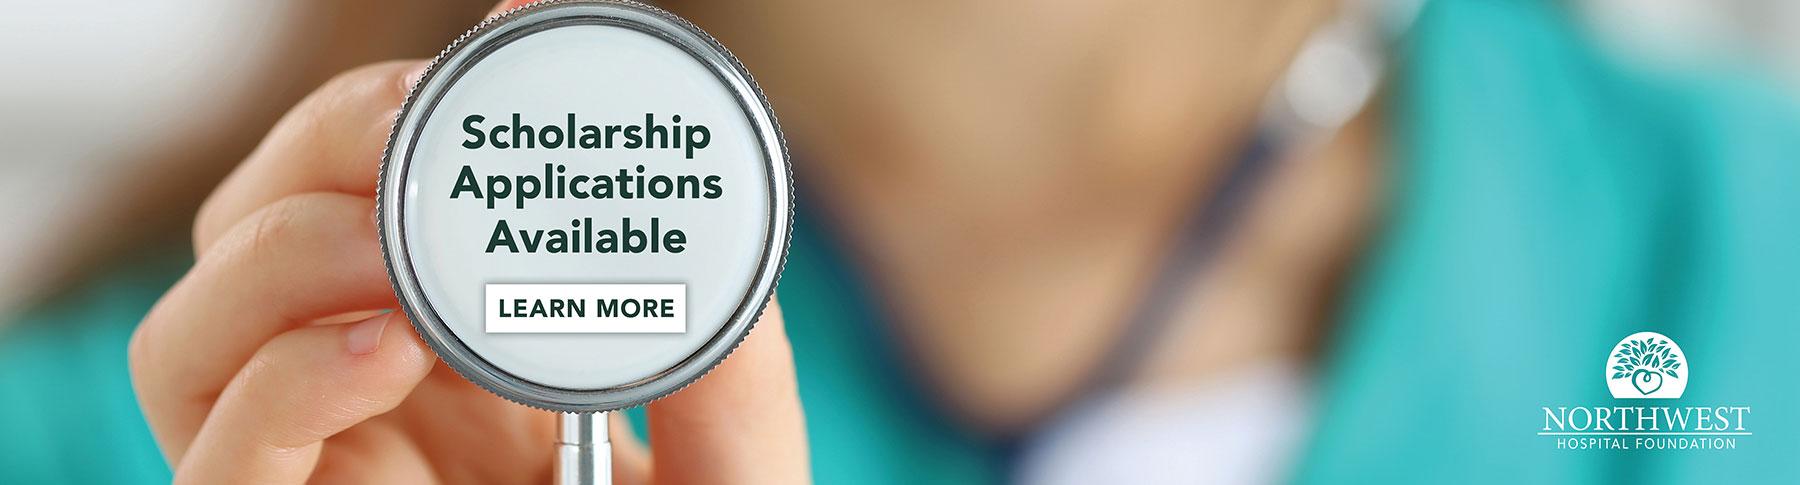 2021_Northwest_Scholarship-Website_Sliders